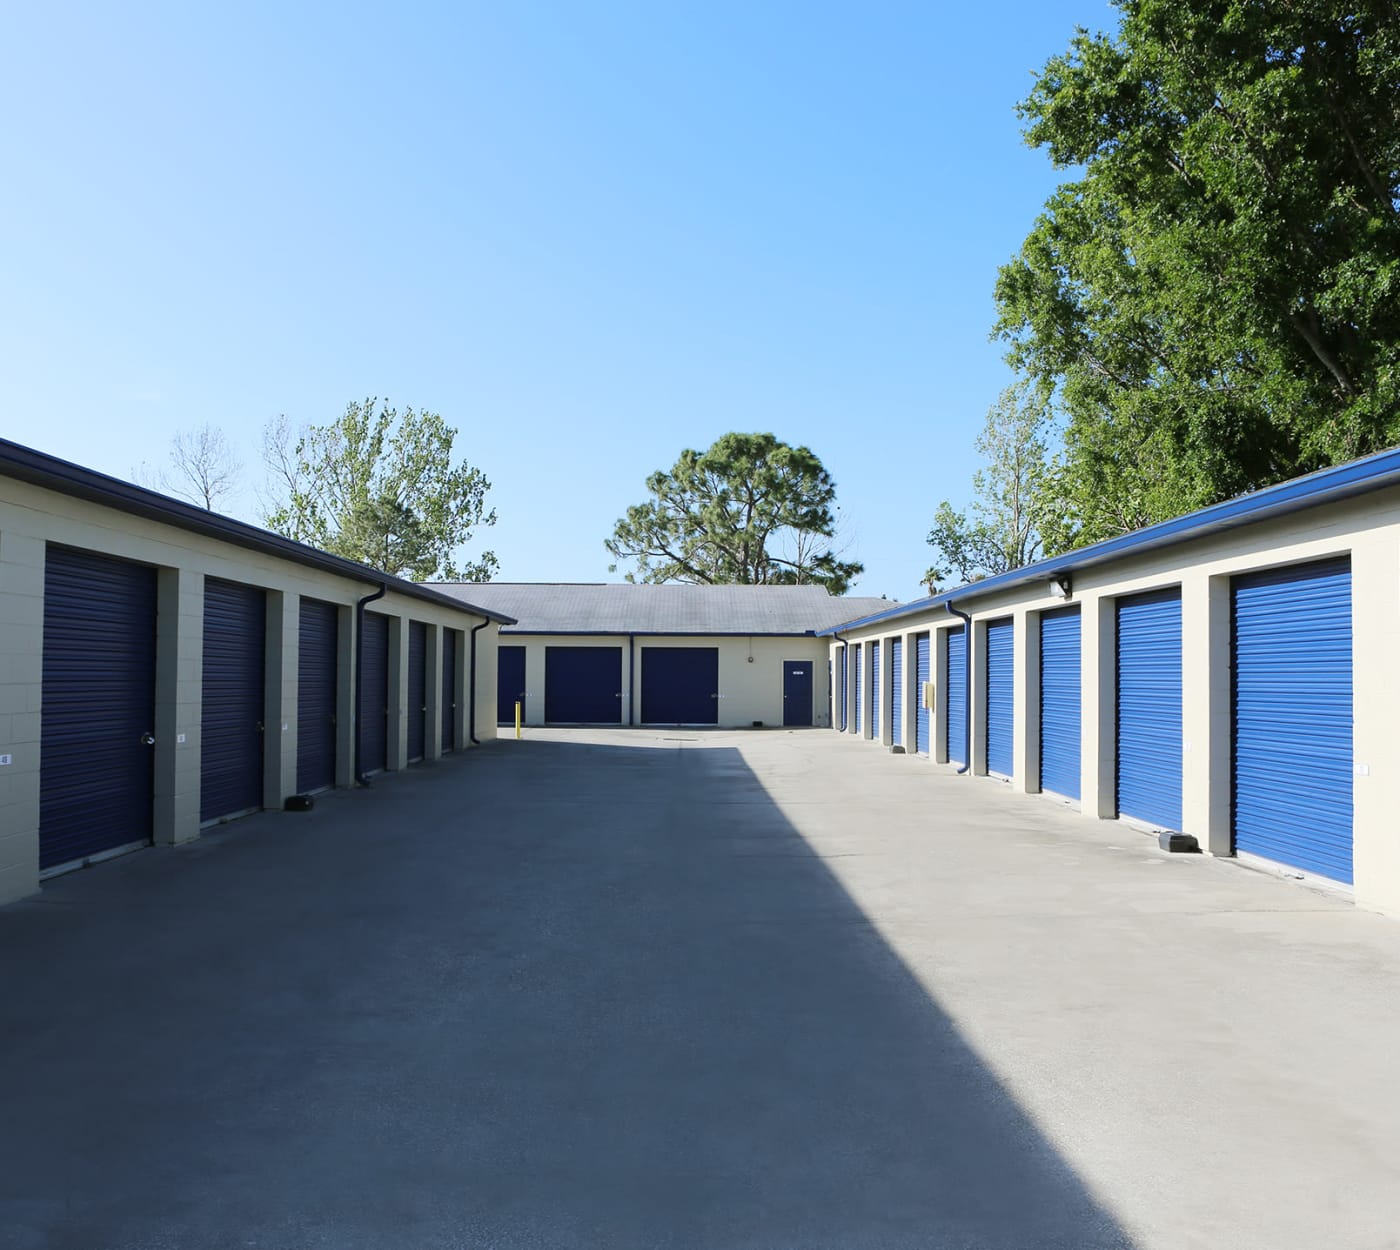 Ground-floor unit at Midgard Self Storage in Brevard, North Carolina